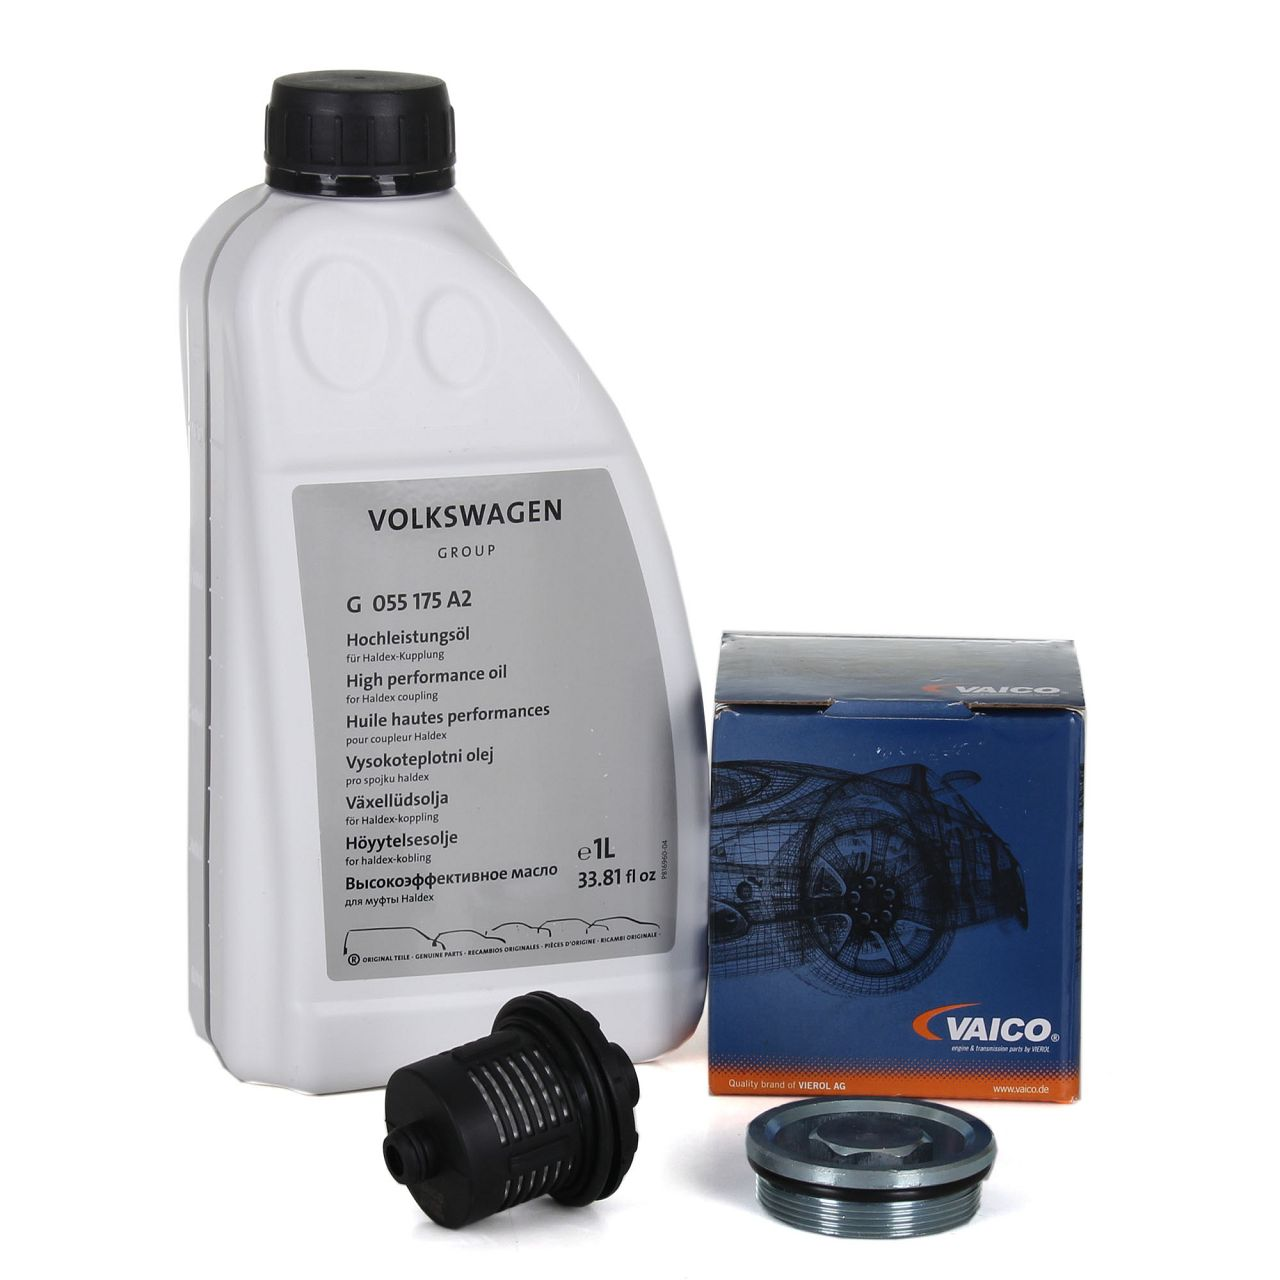 VAICO Getriebefilter + ORIGINAL VAG Hochleistungsöl Haldex-Öl ALLRAD HALDEX 1L